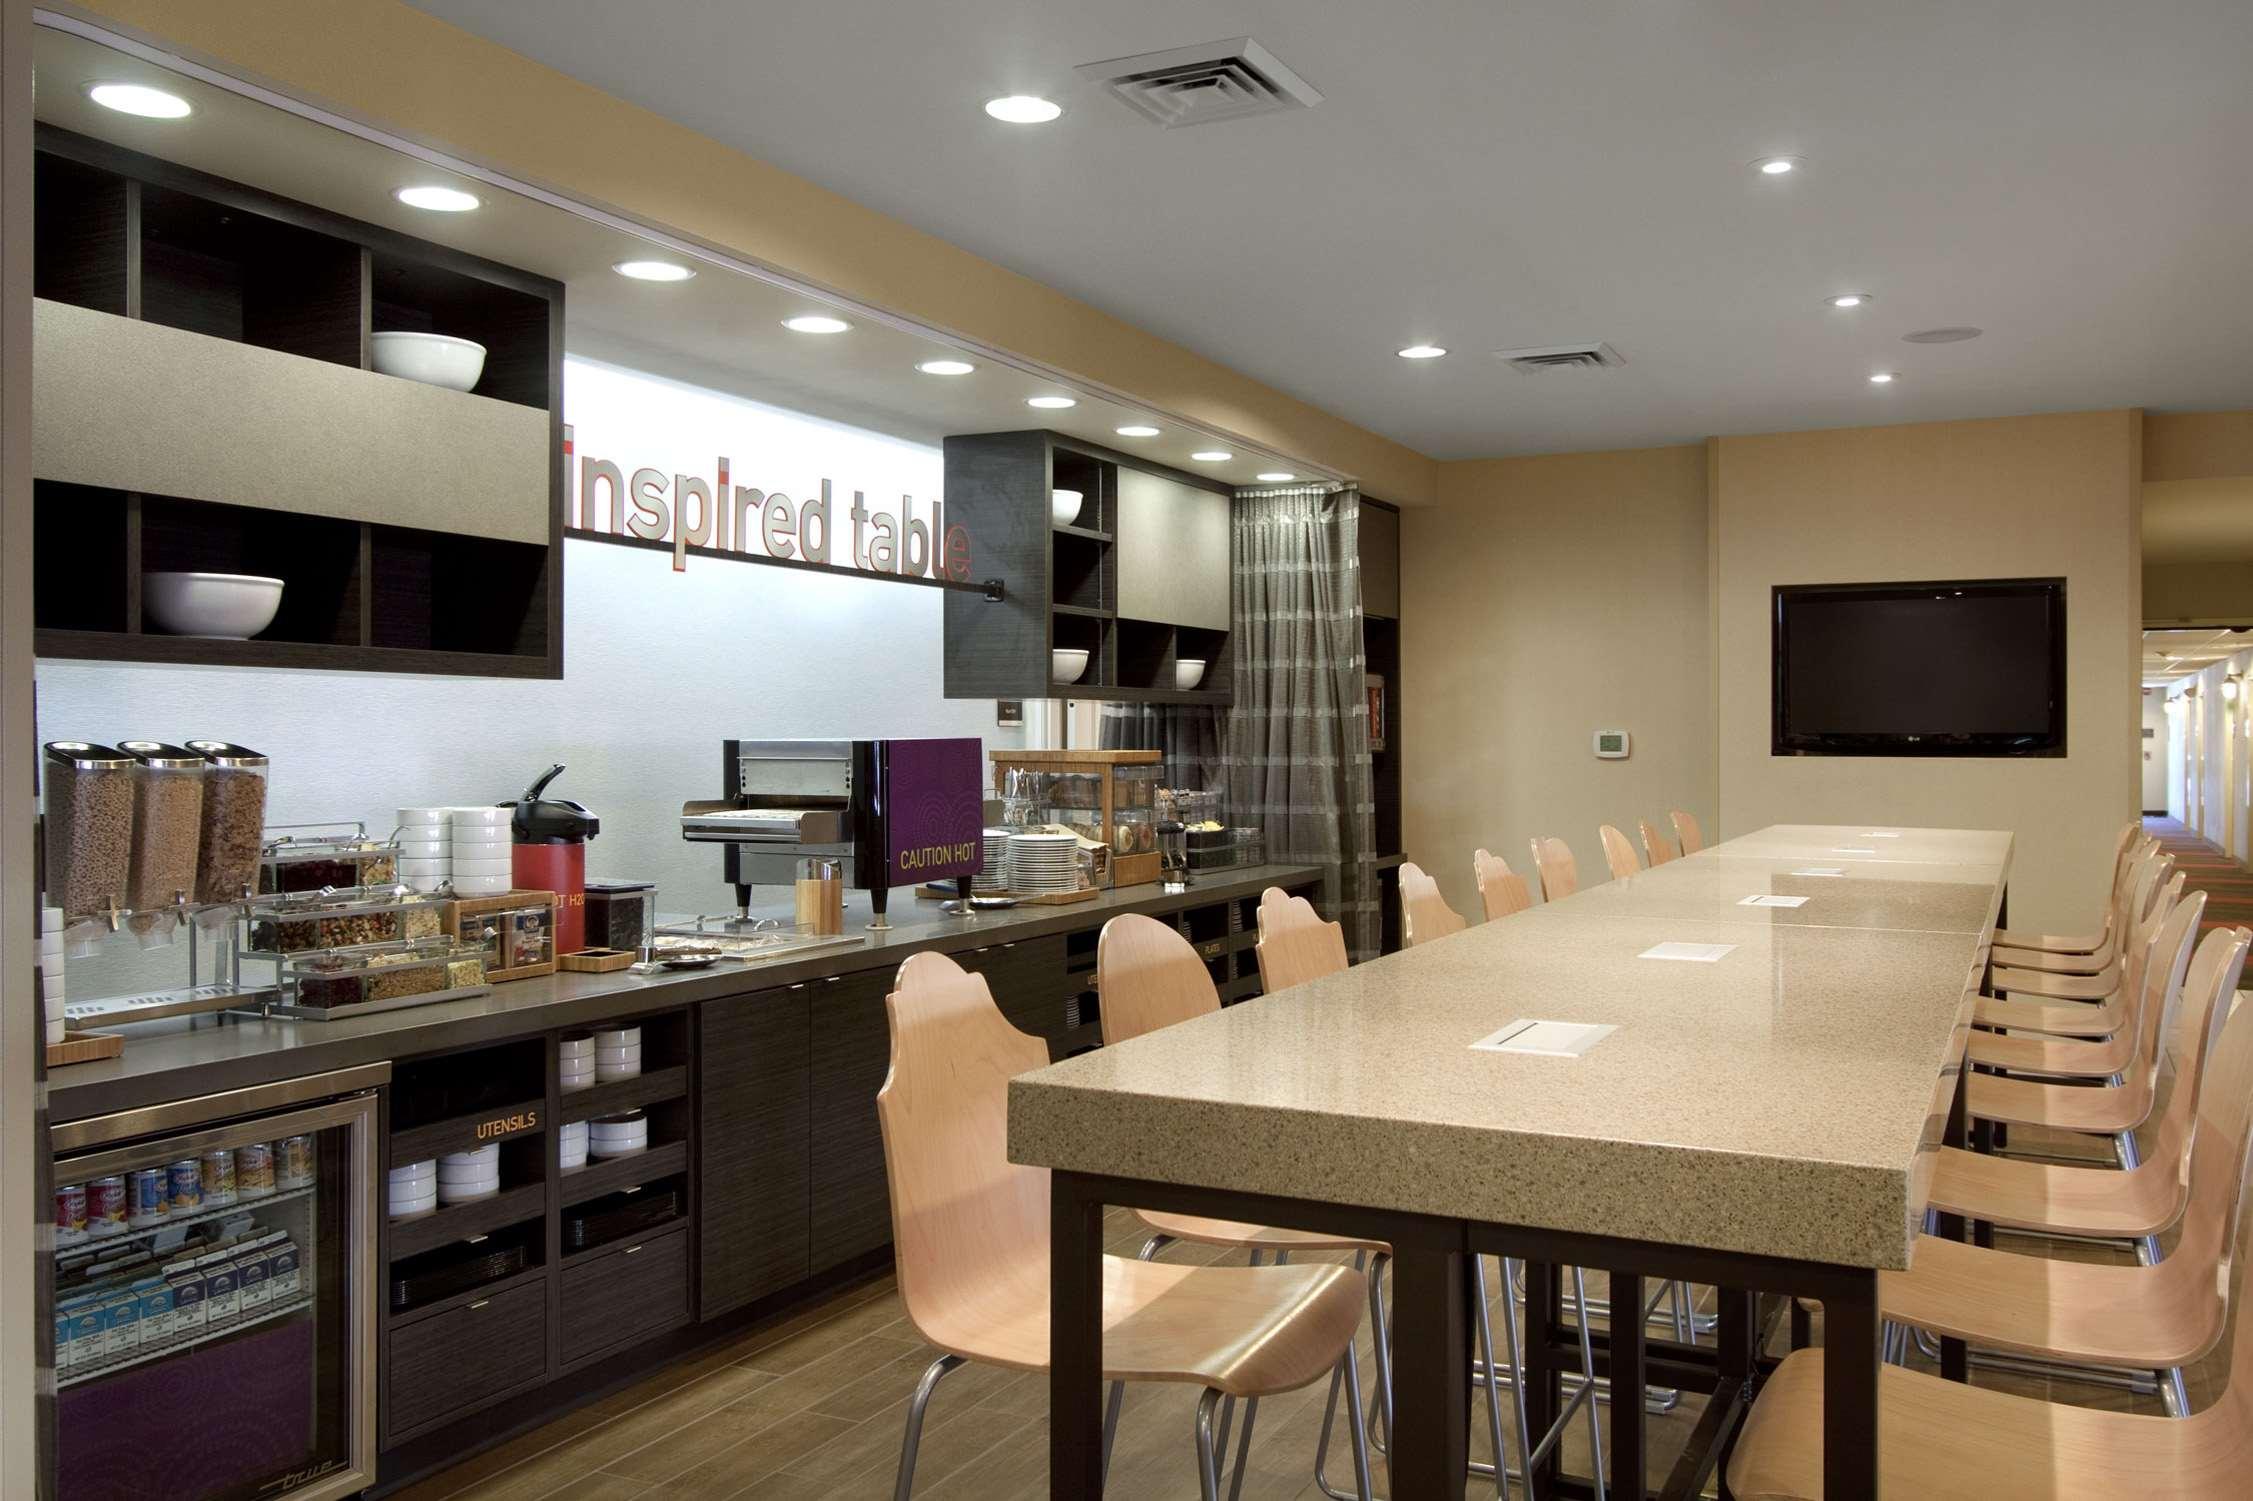 Home2 Suites by Hilton Fayetteville, NC image 0